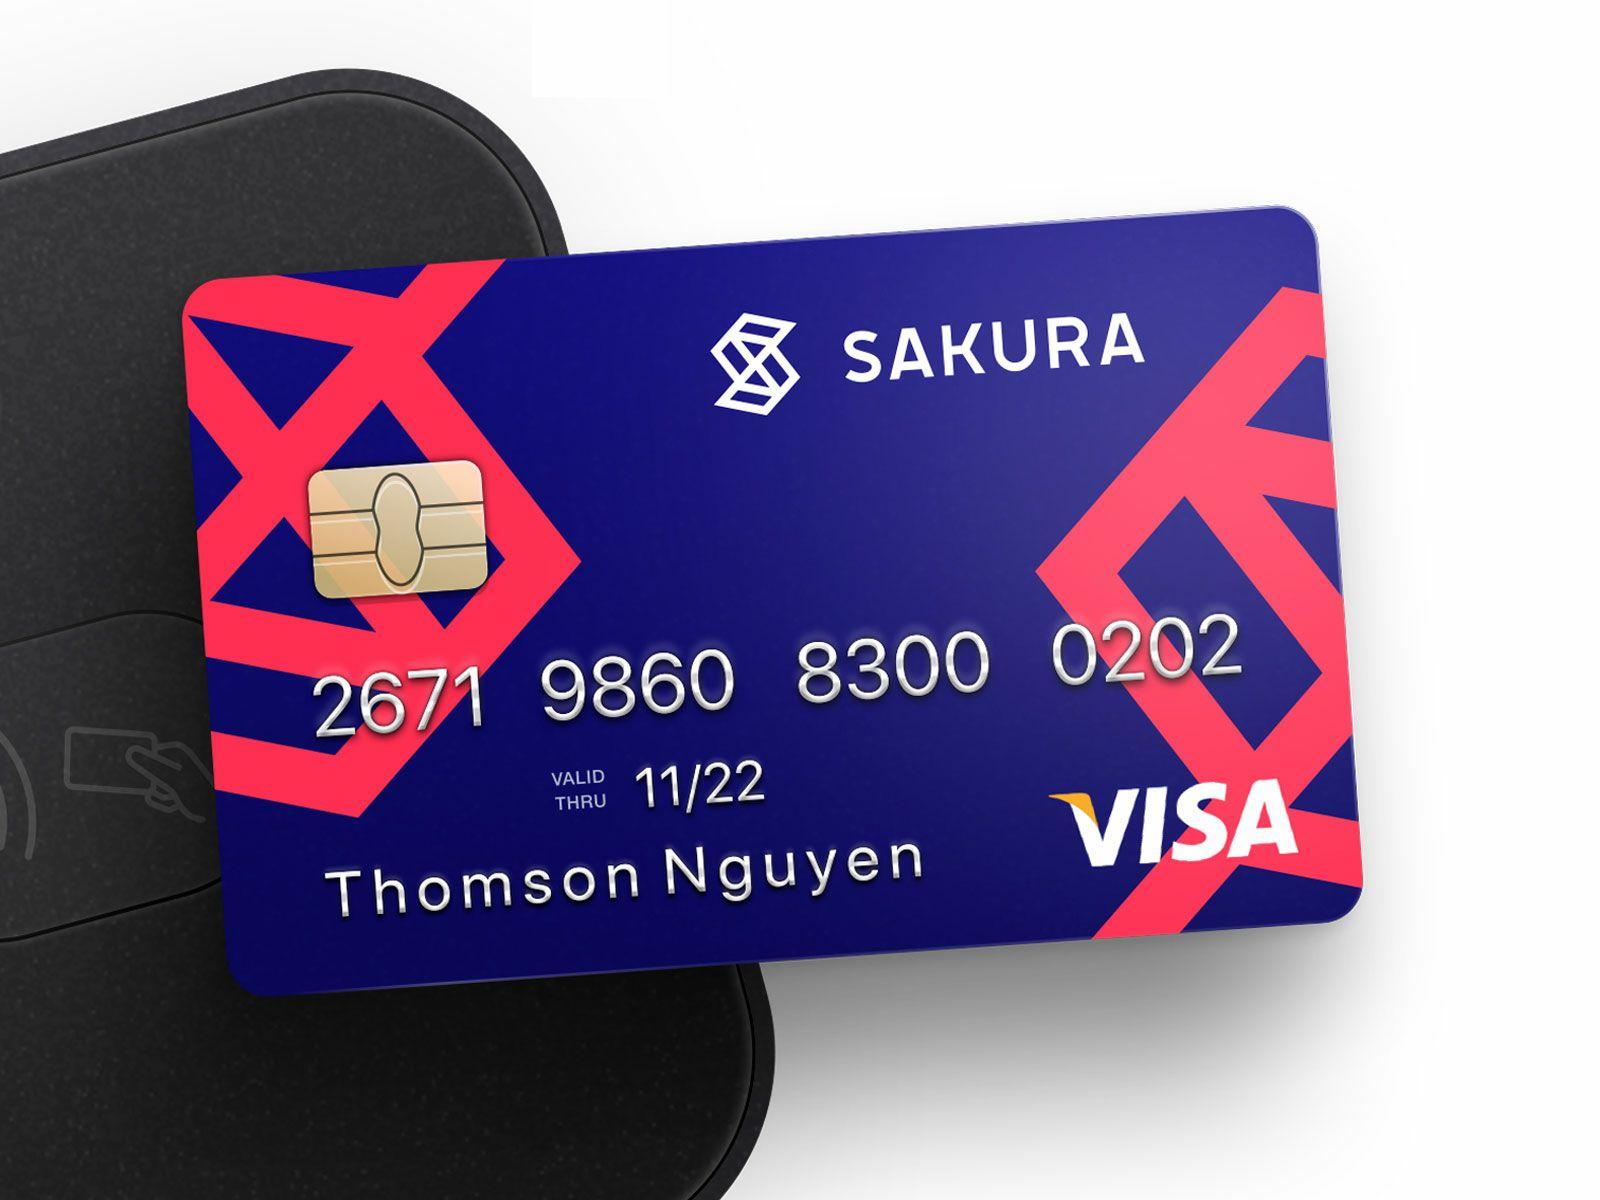 Sakura Credit Card Design Gift Card Number Card Design